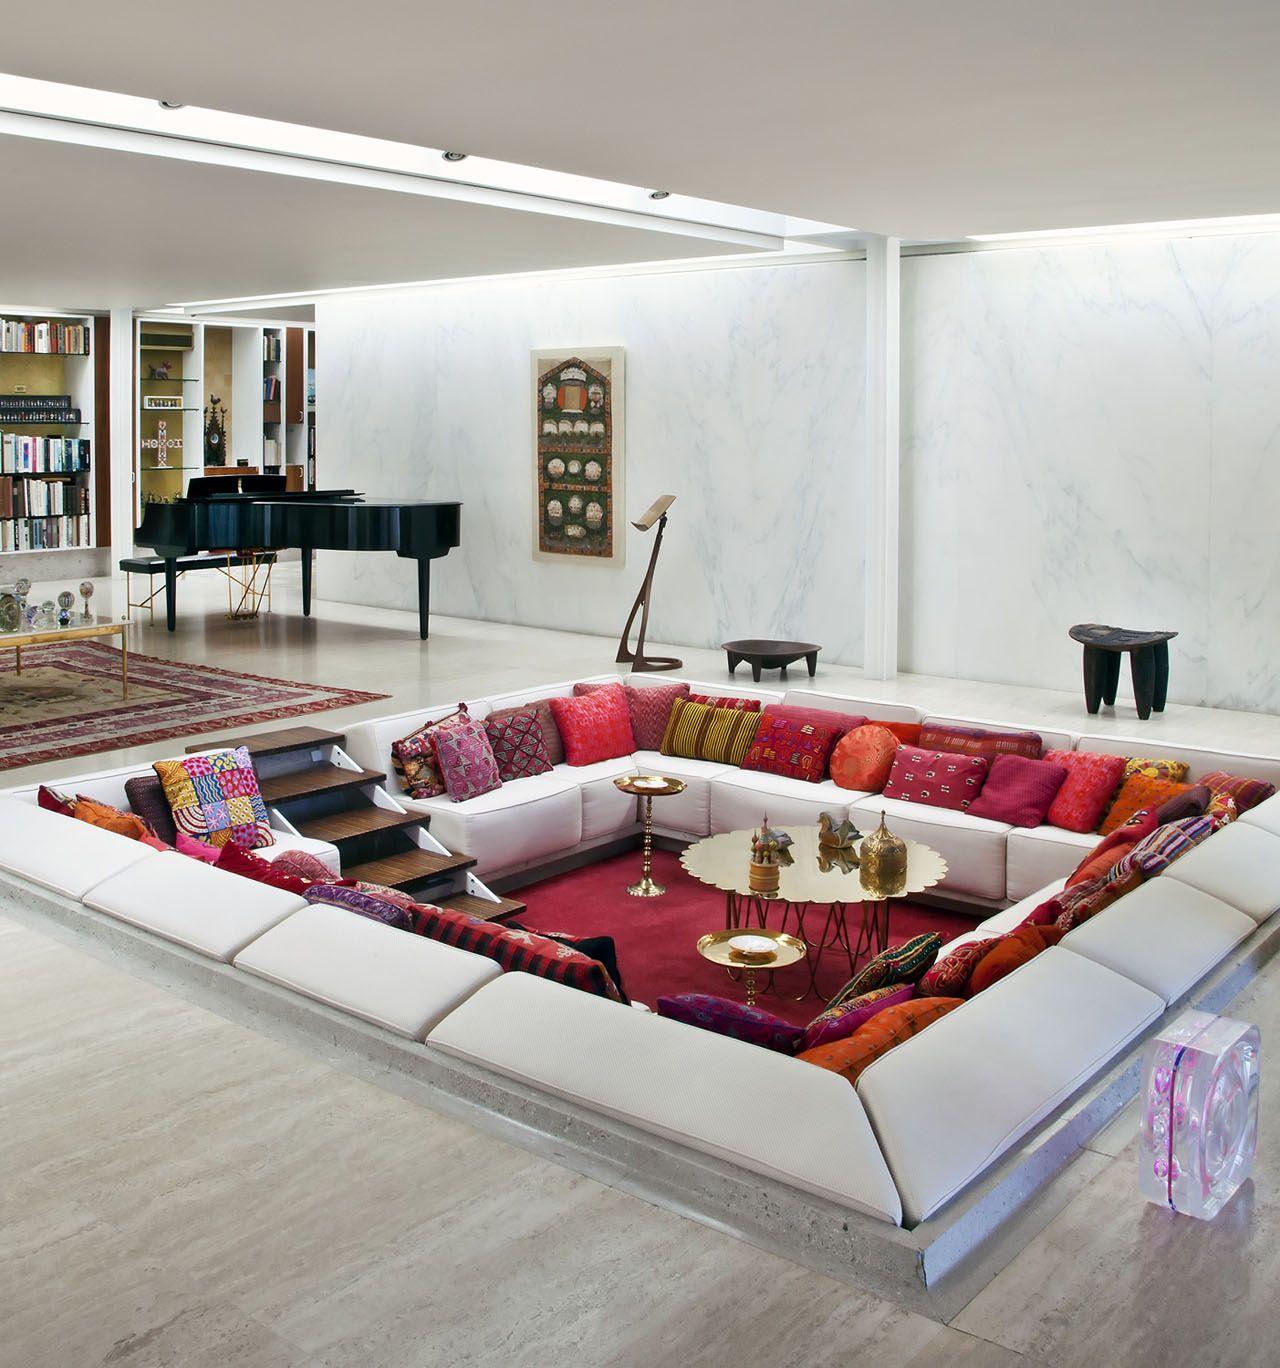 Dfw Furniture Columbus Ohio: Eero Saarinen's Miller House